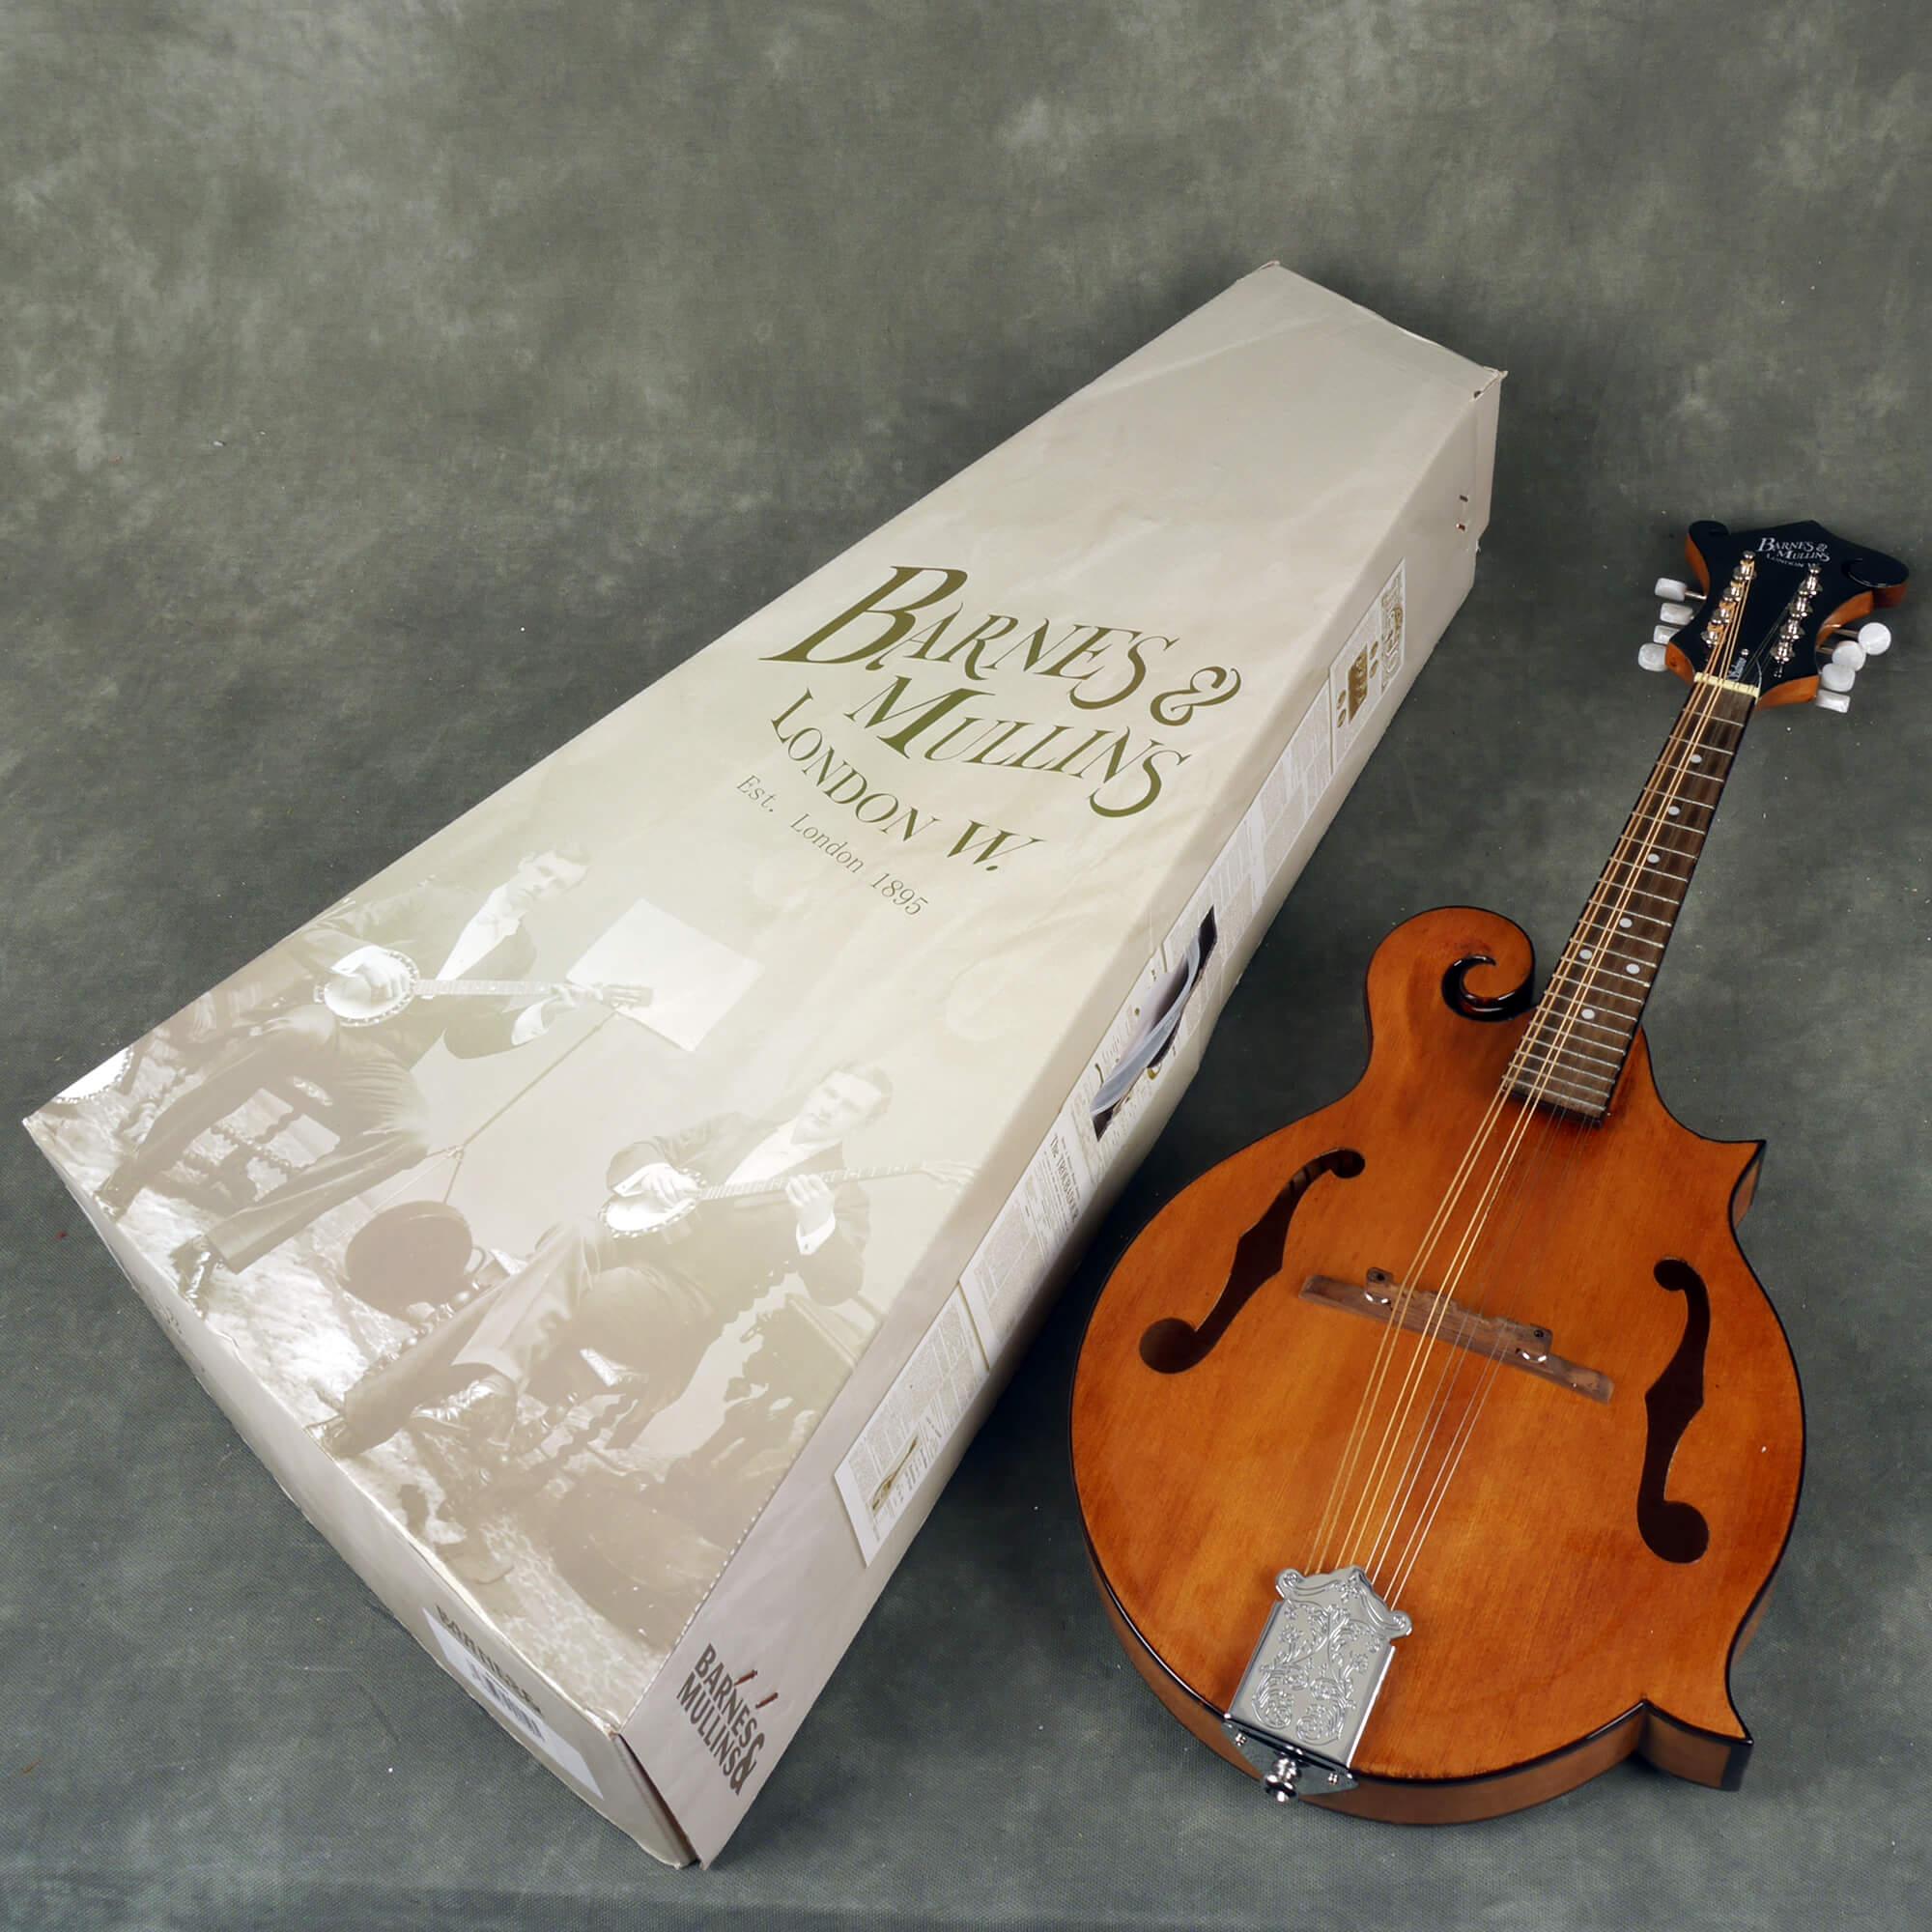 Barnes and Mullins BM650 Salvino Mandolin w/Box - 2nd Hand ...